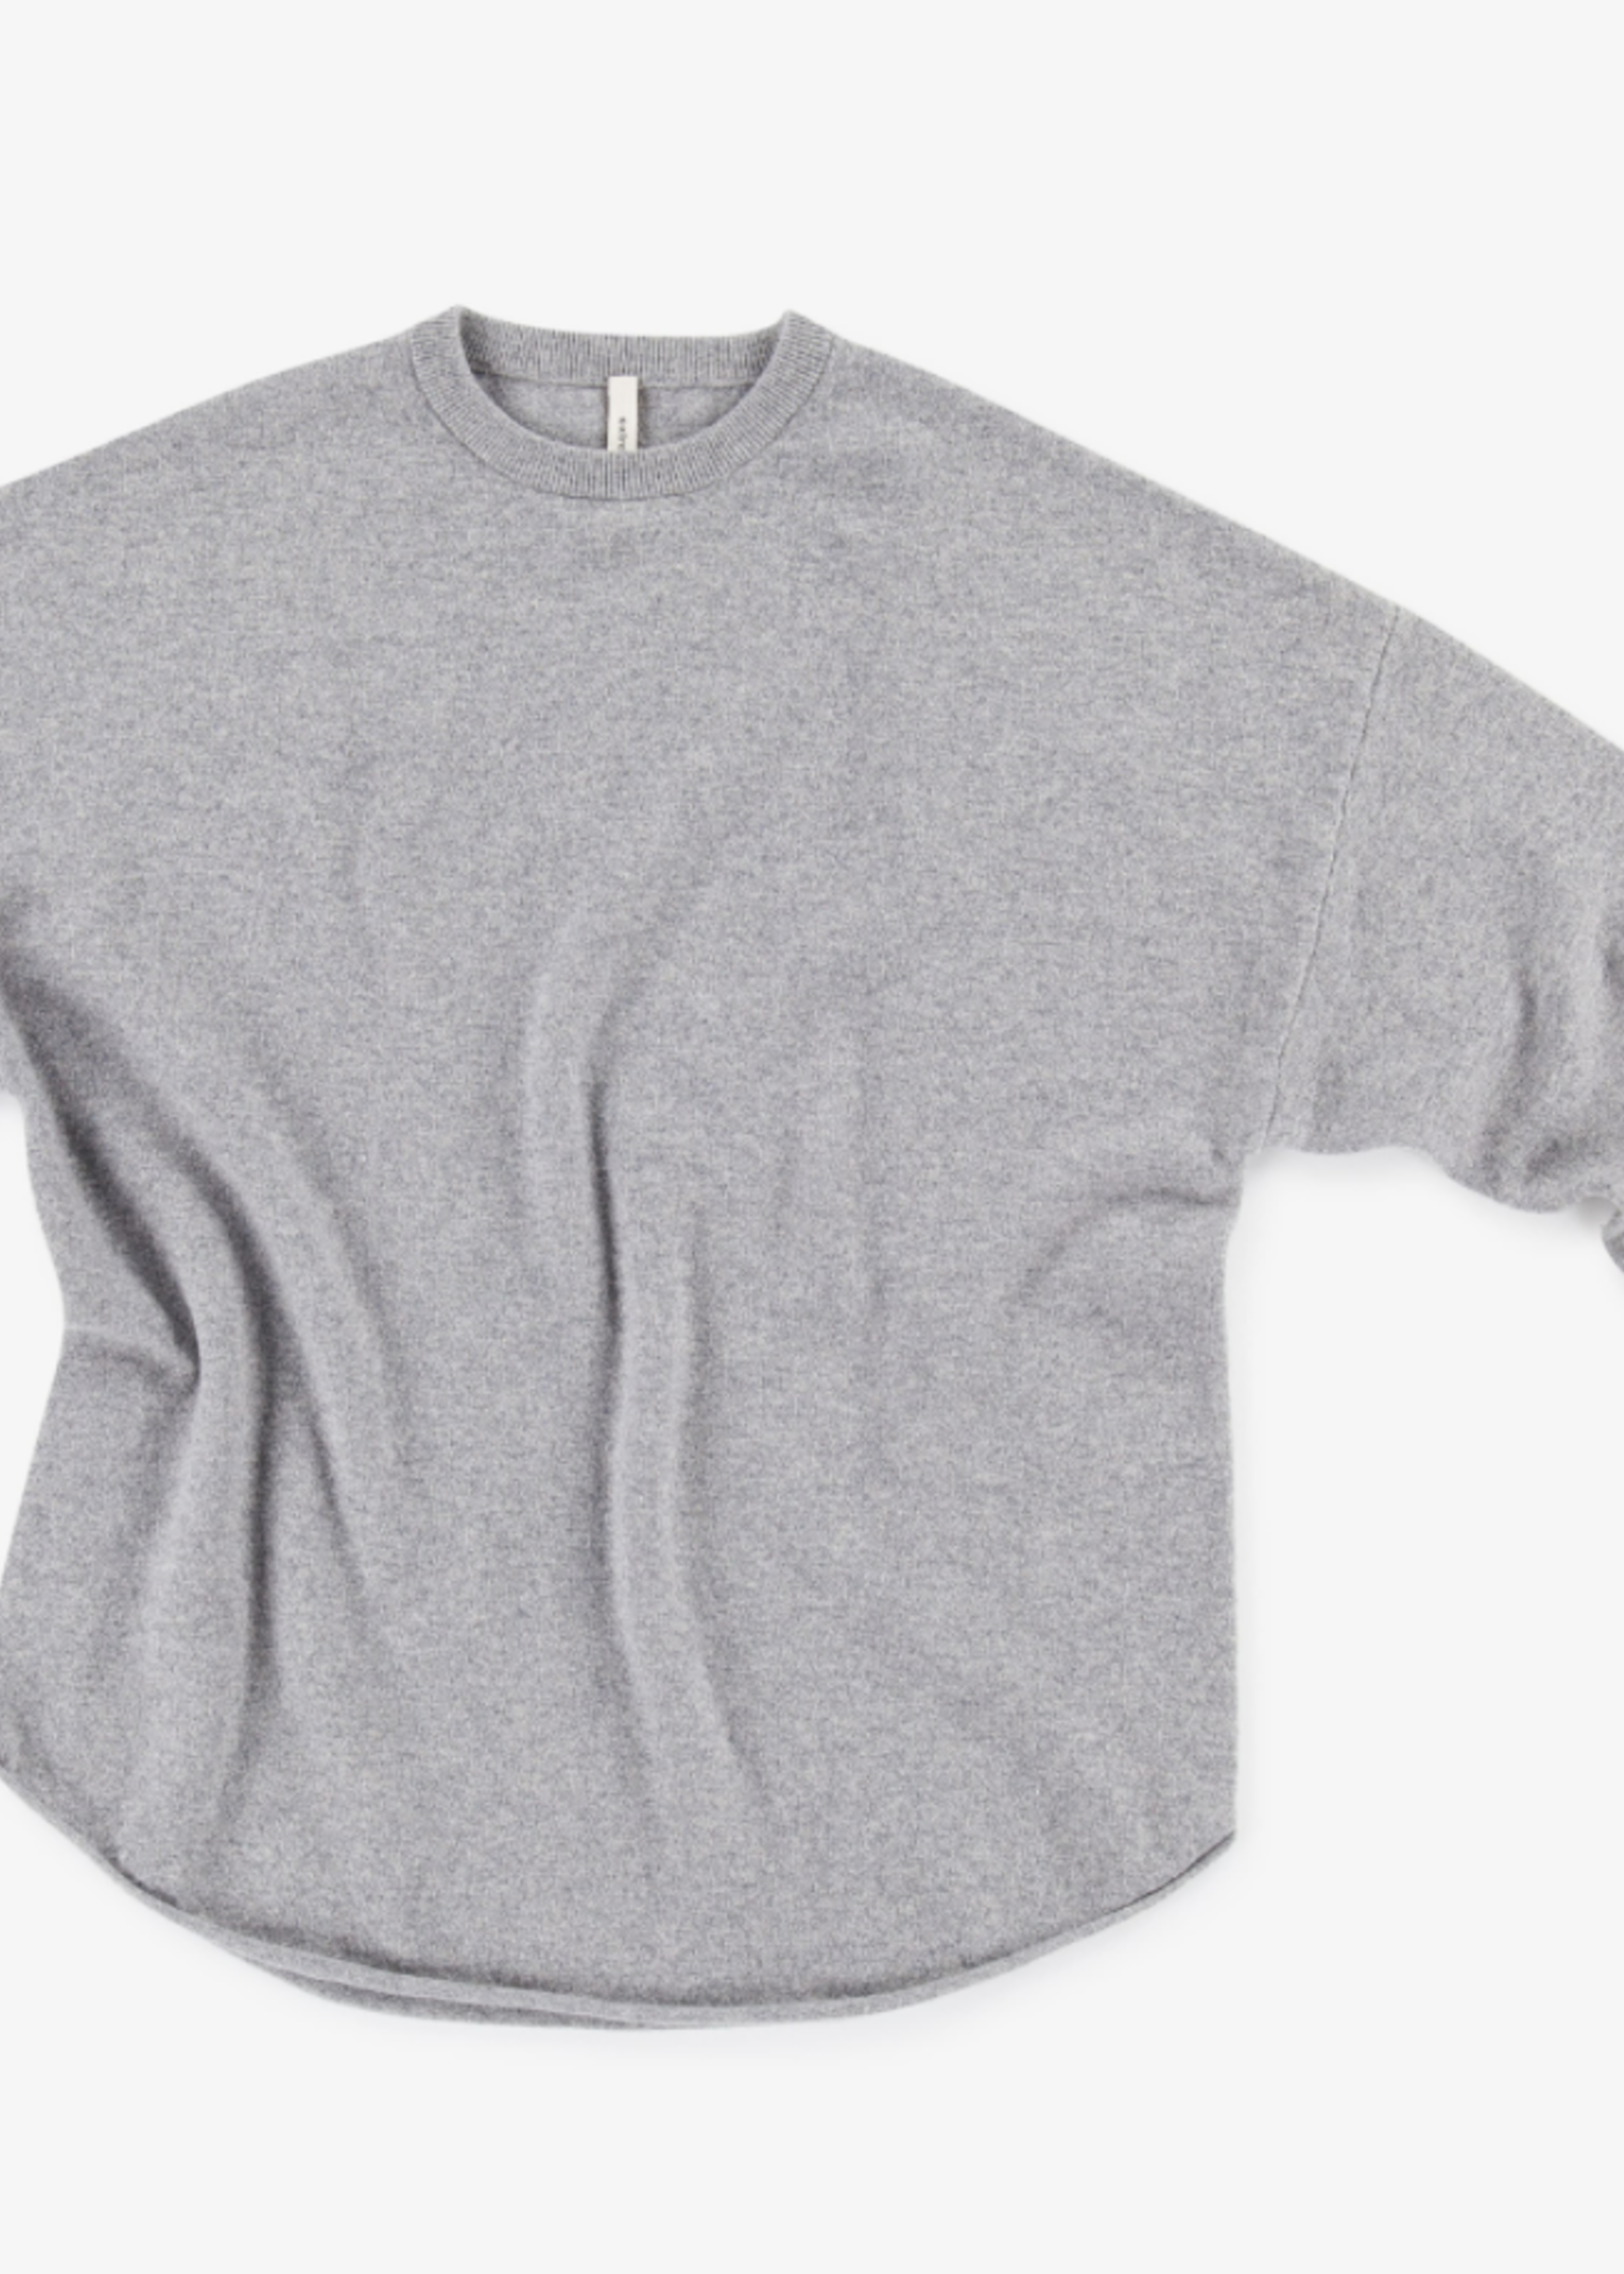 extremecashmere x extreme cashmere crewhop grey melange